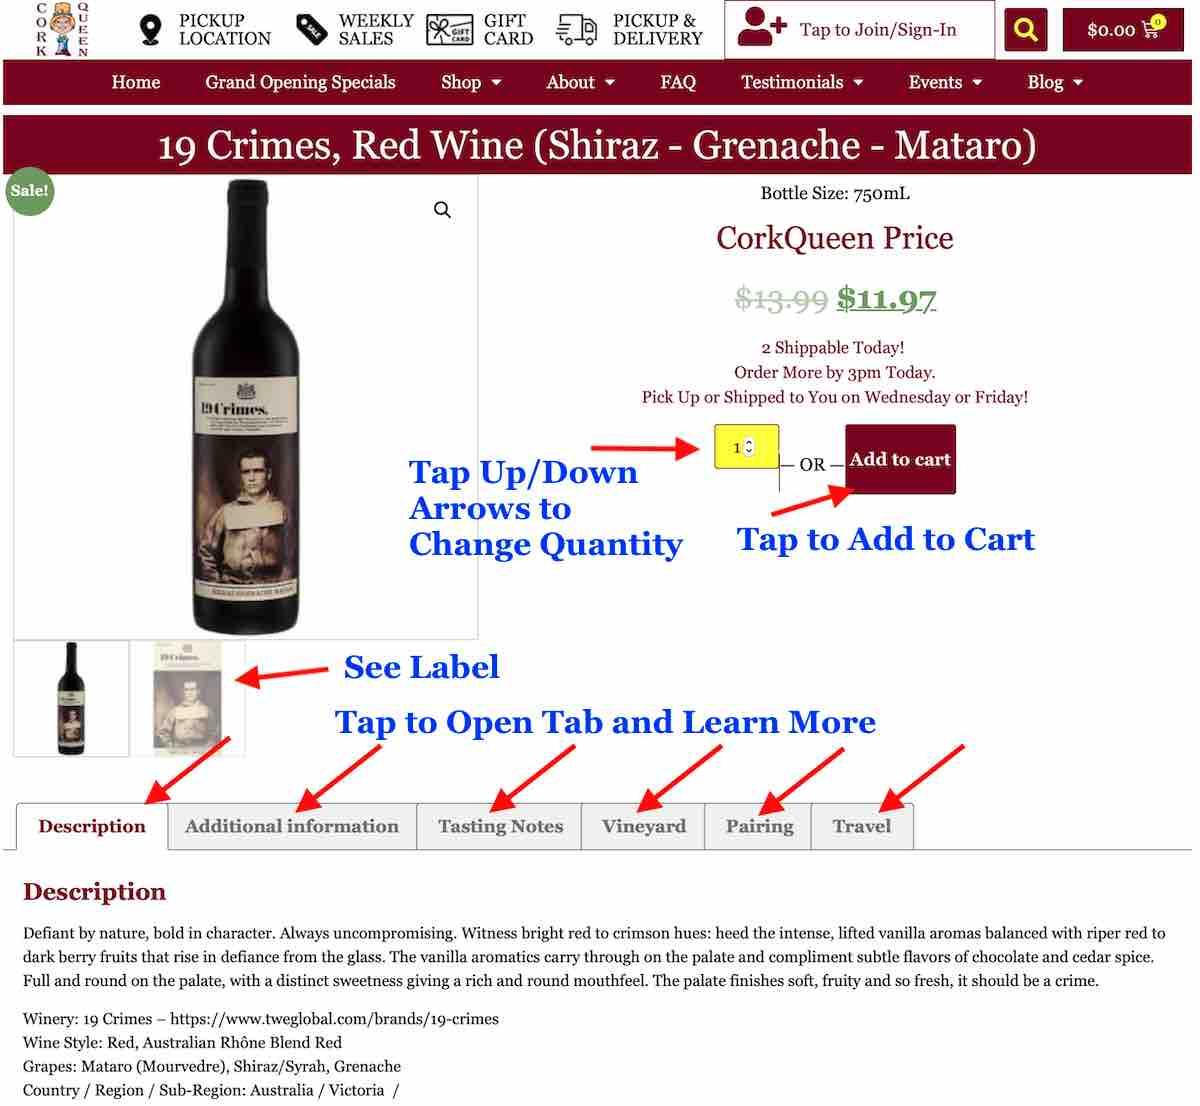 Order Wine - Step 2b